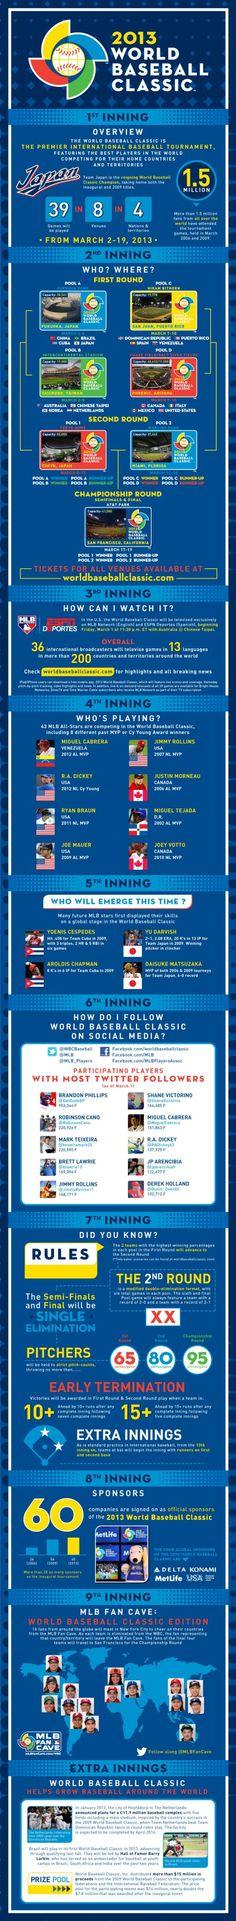 World Baseball Classic Infographic